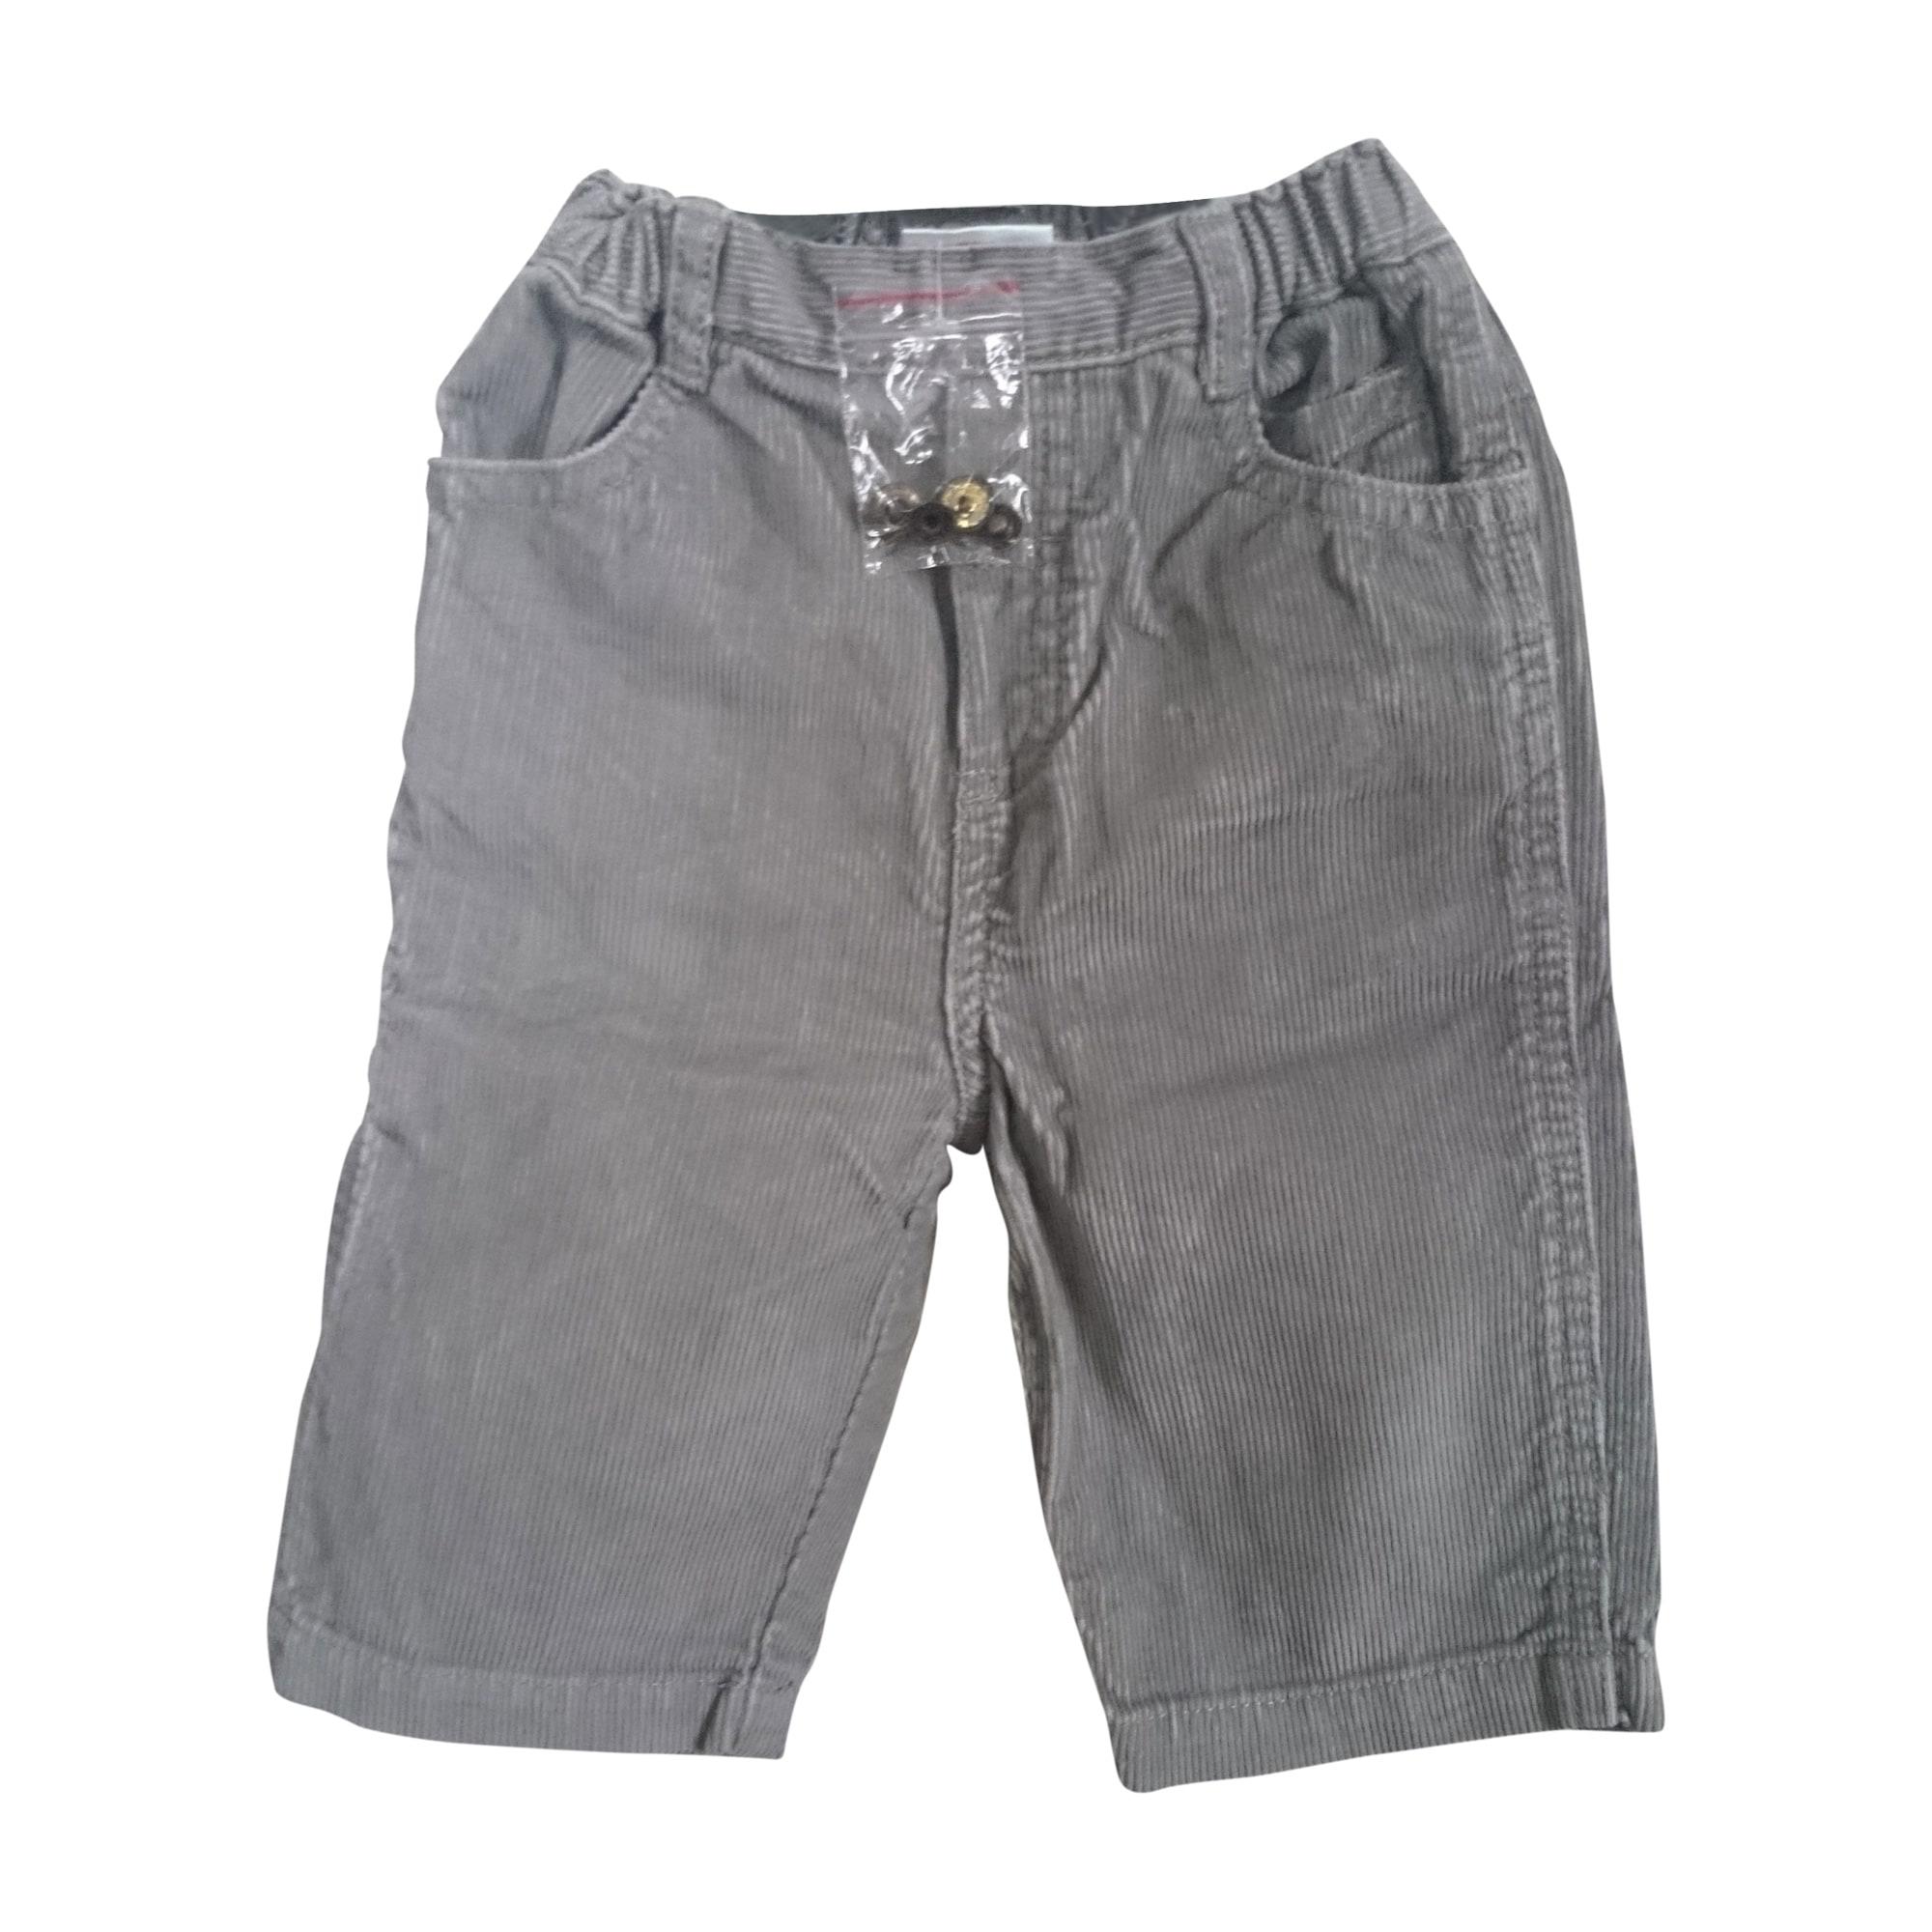 Pantalon JACADI Gris, anthracite